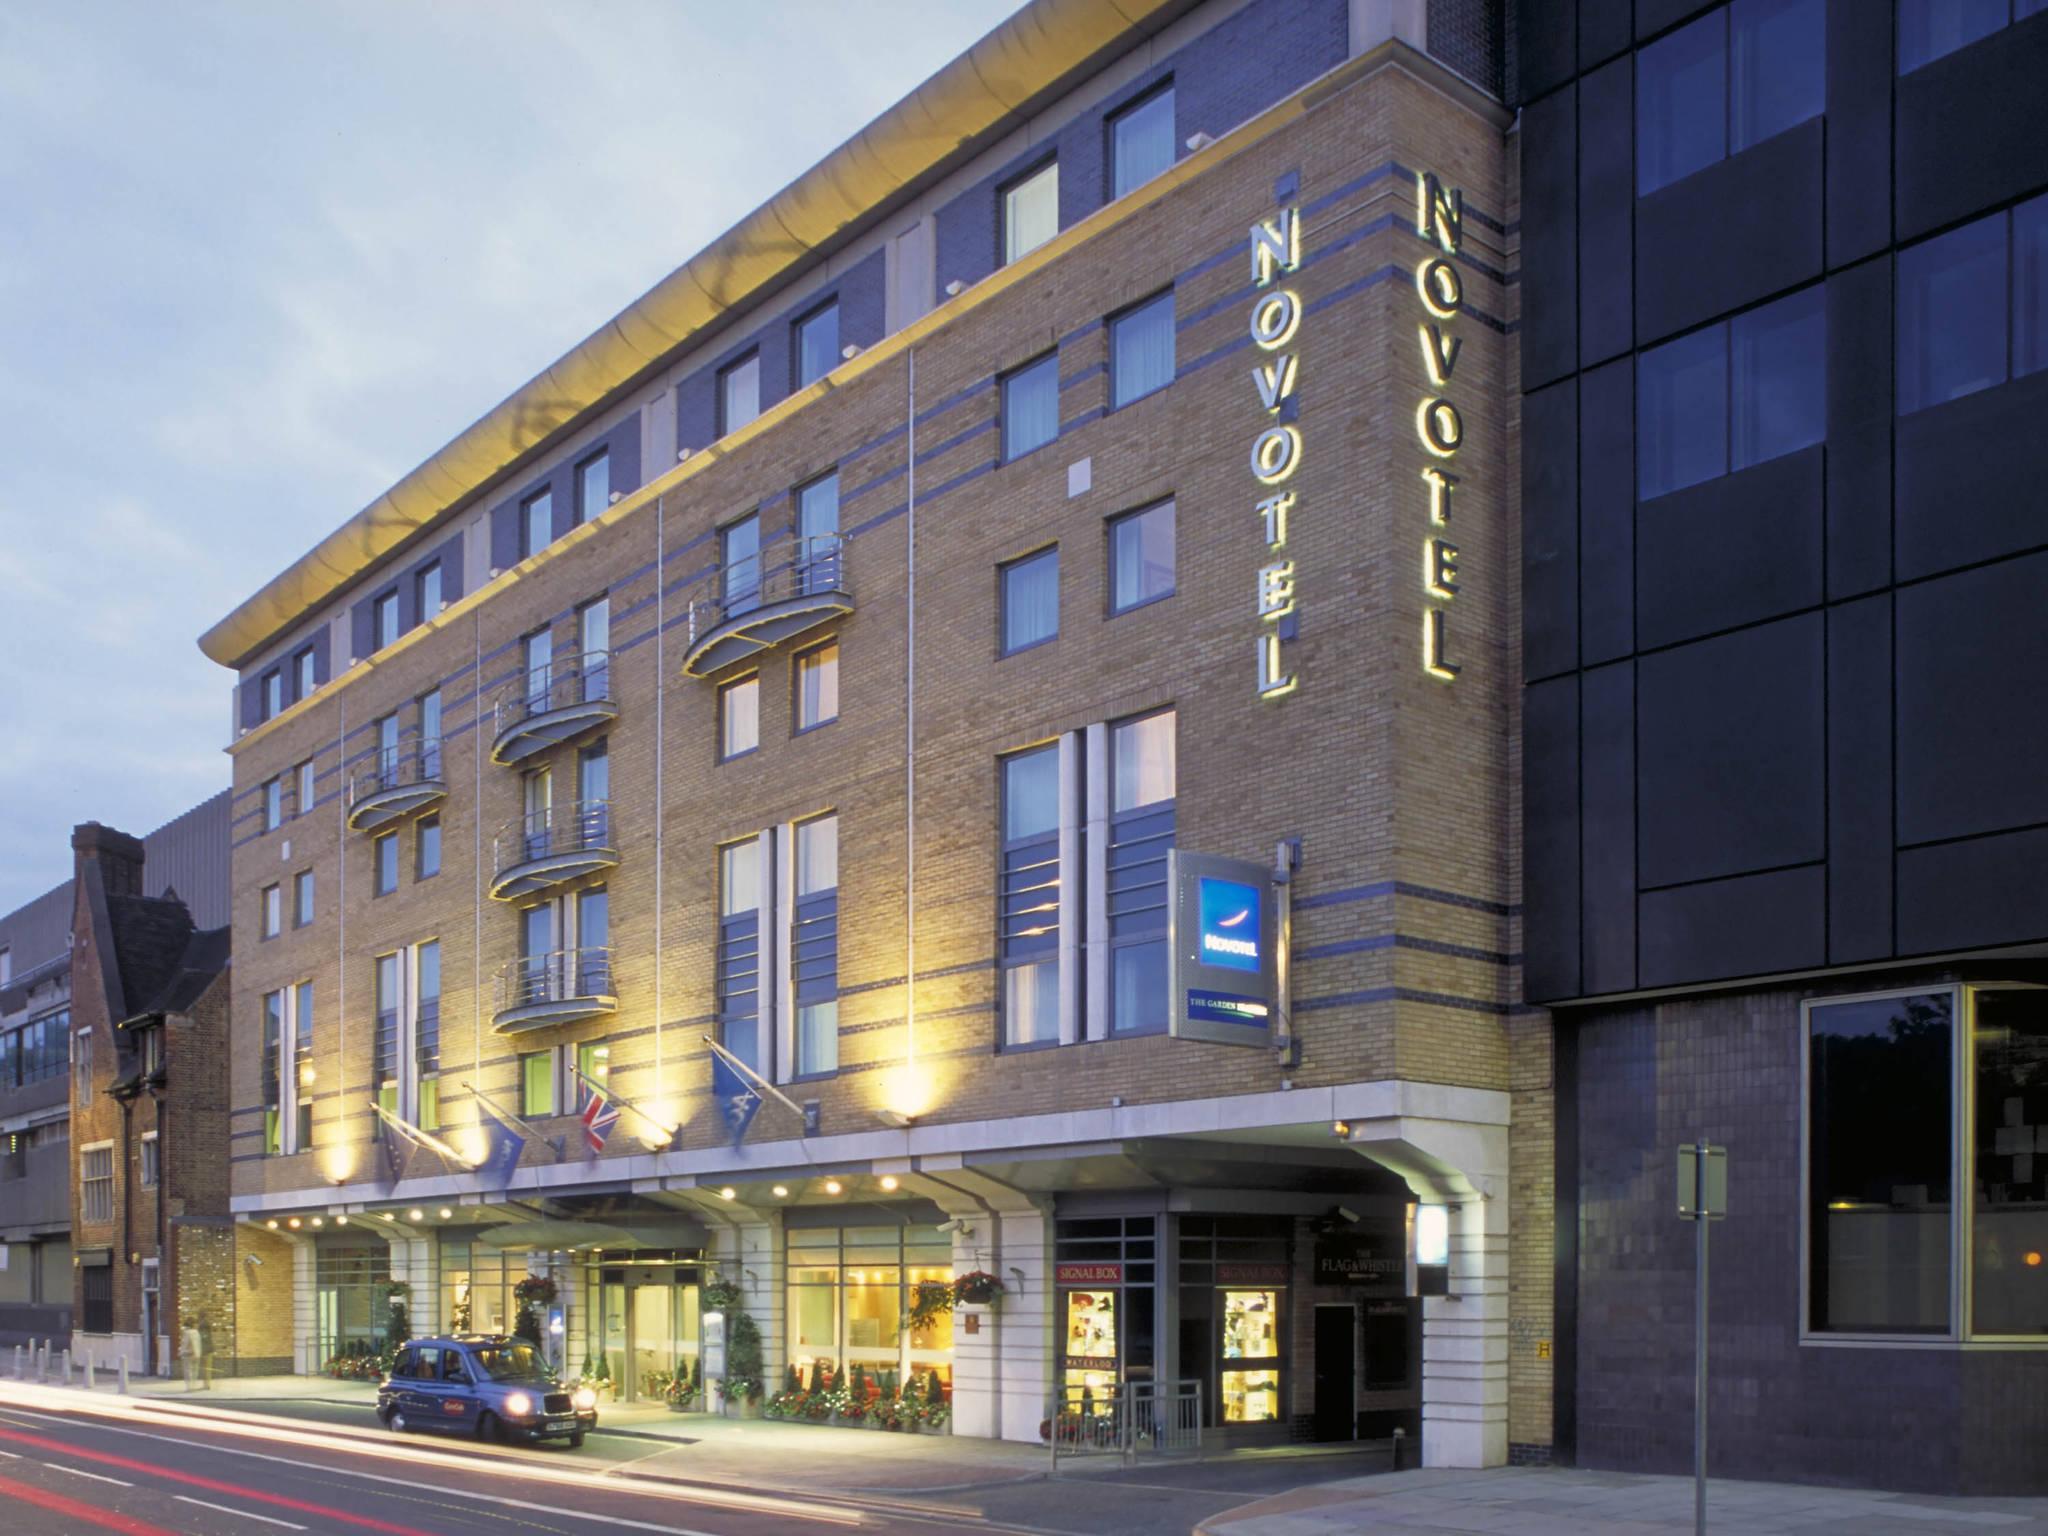 Hotel a londra novotel londra waterloo for Hotel per londra